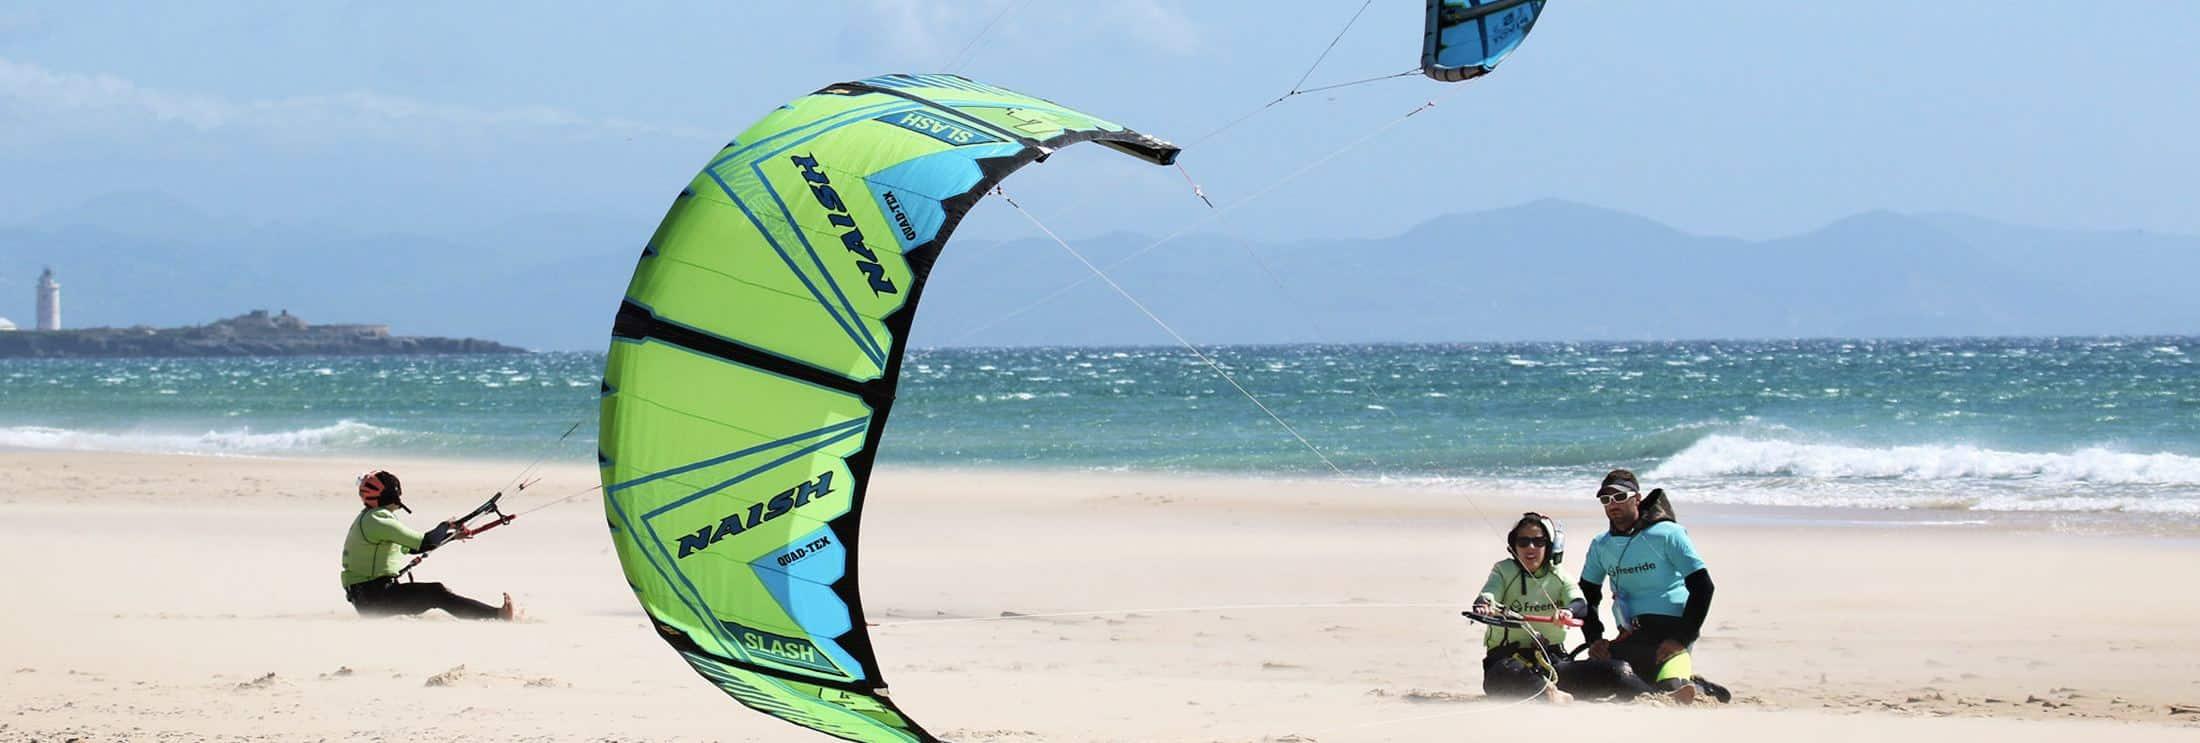 Plage de Los Lances Nord a Tarifa, spot de kitesurf